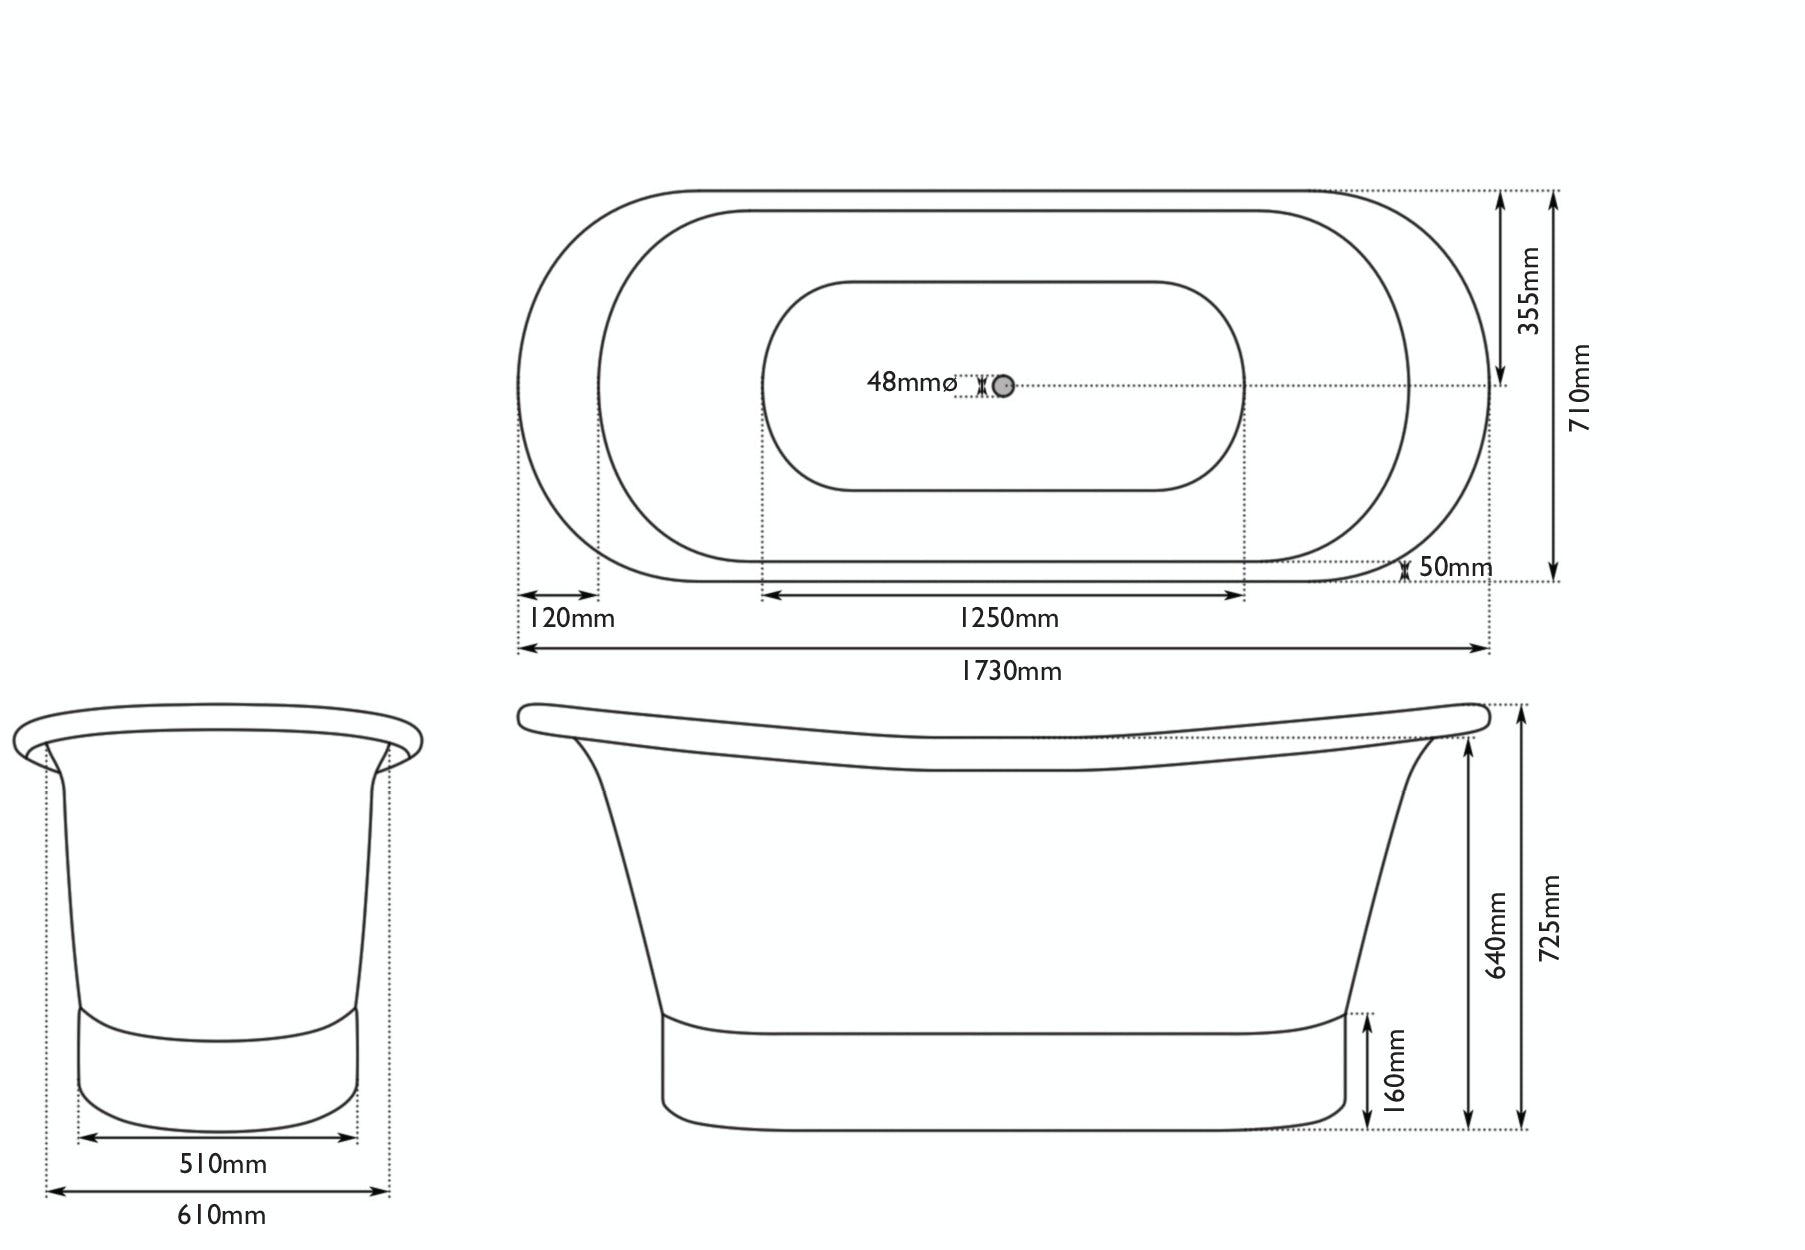 Dimensions for Belle de Louvain Rembrandt copper and nickel bath